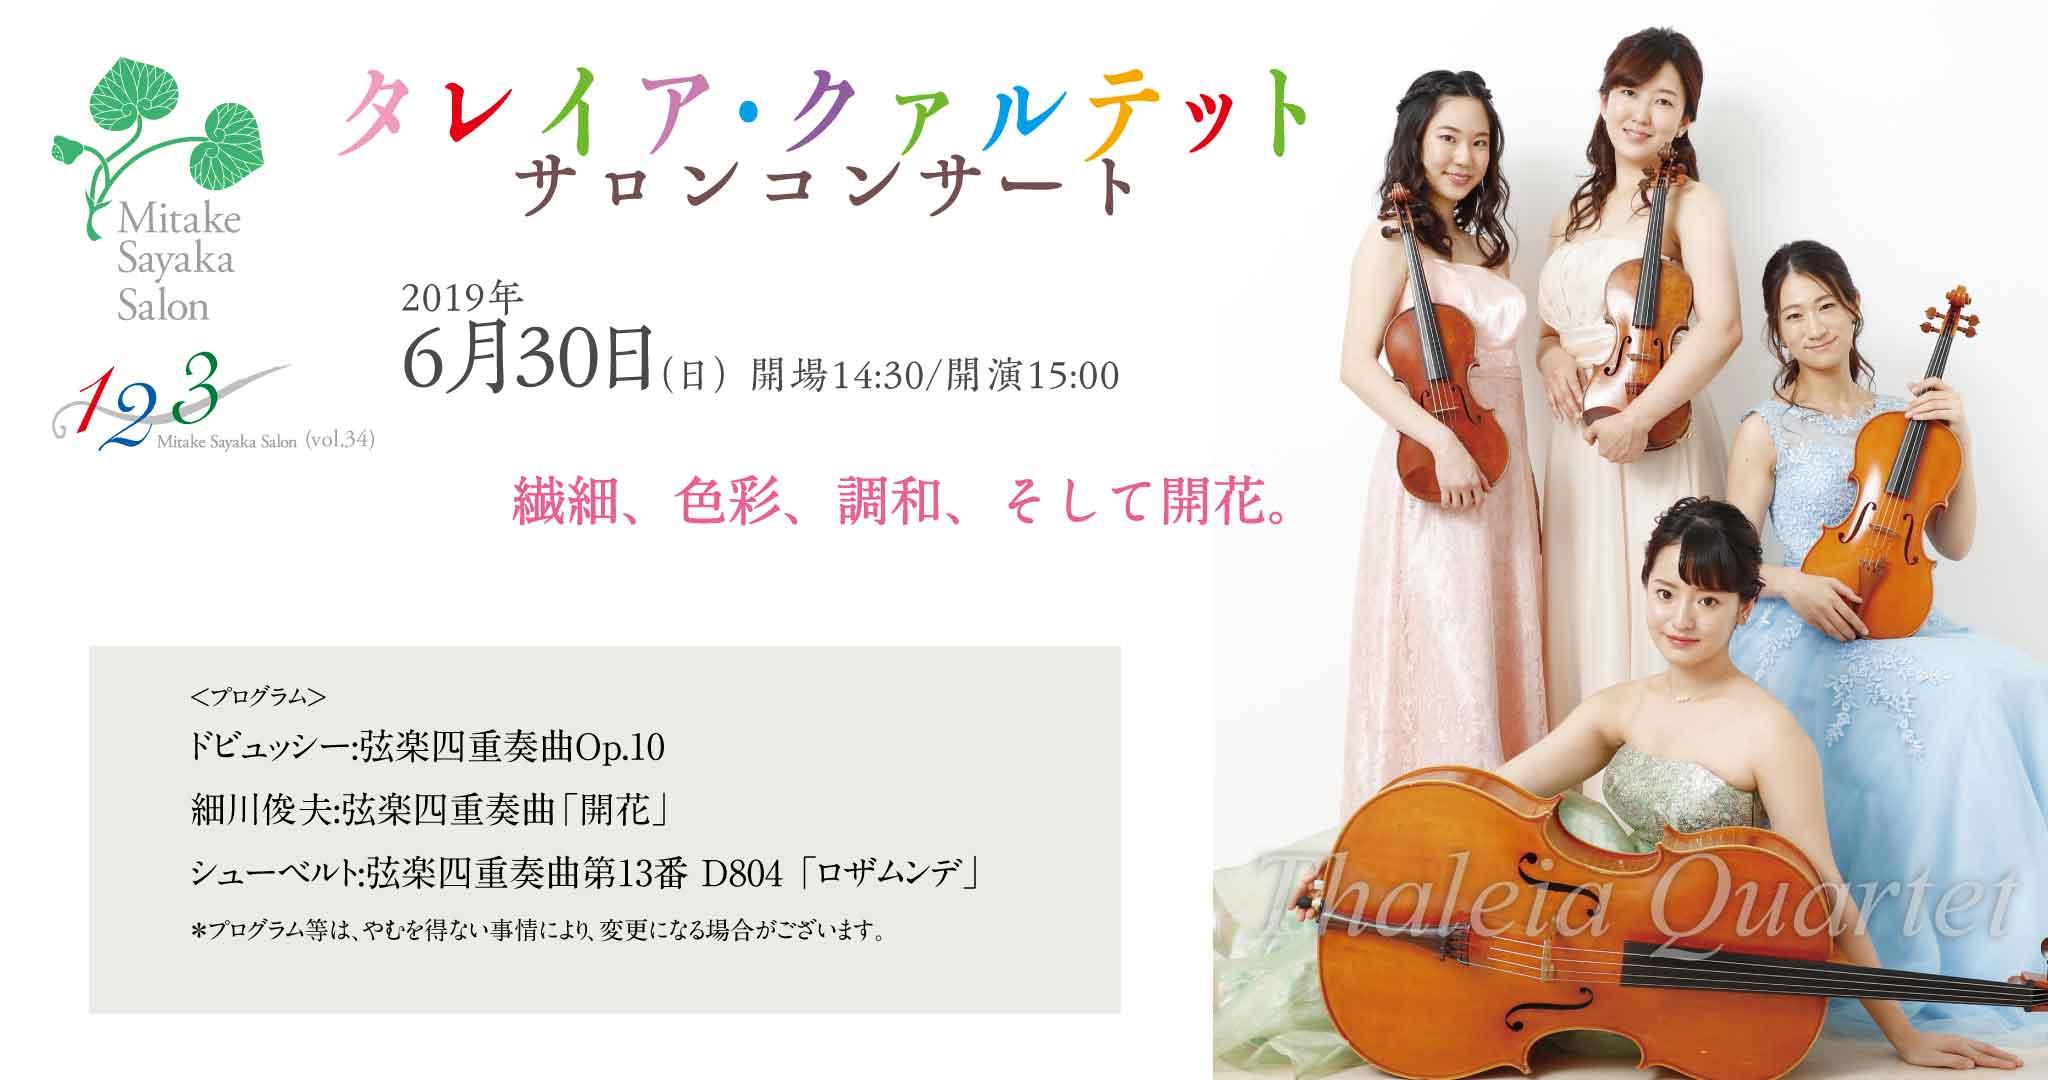 Thaleia Quartet(タレイア・クァルテット)サロンコンサート